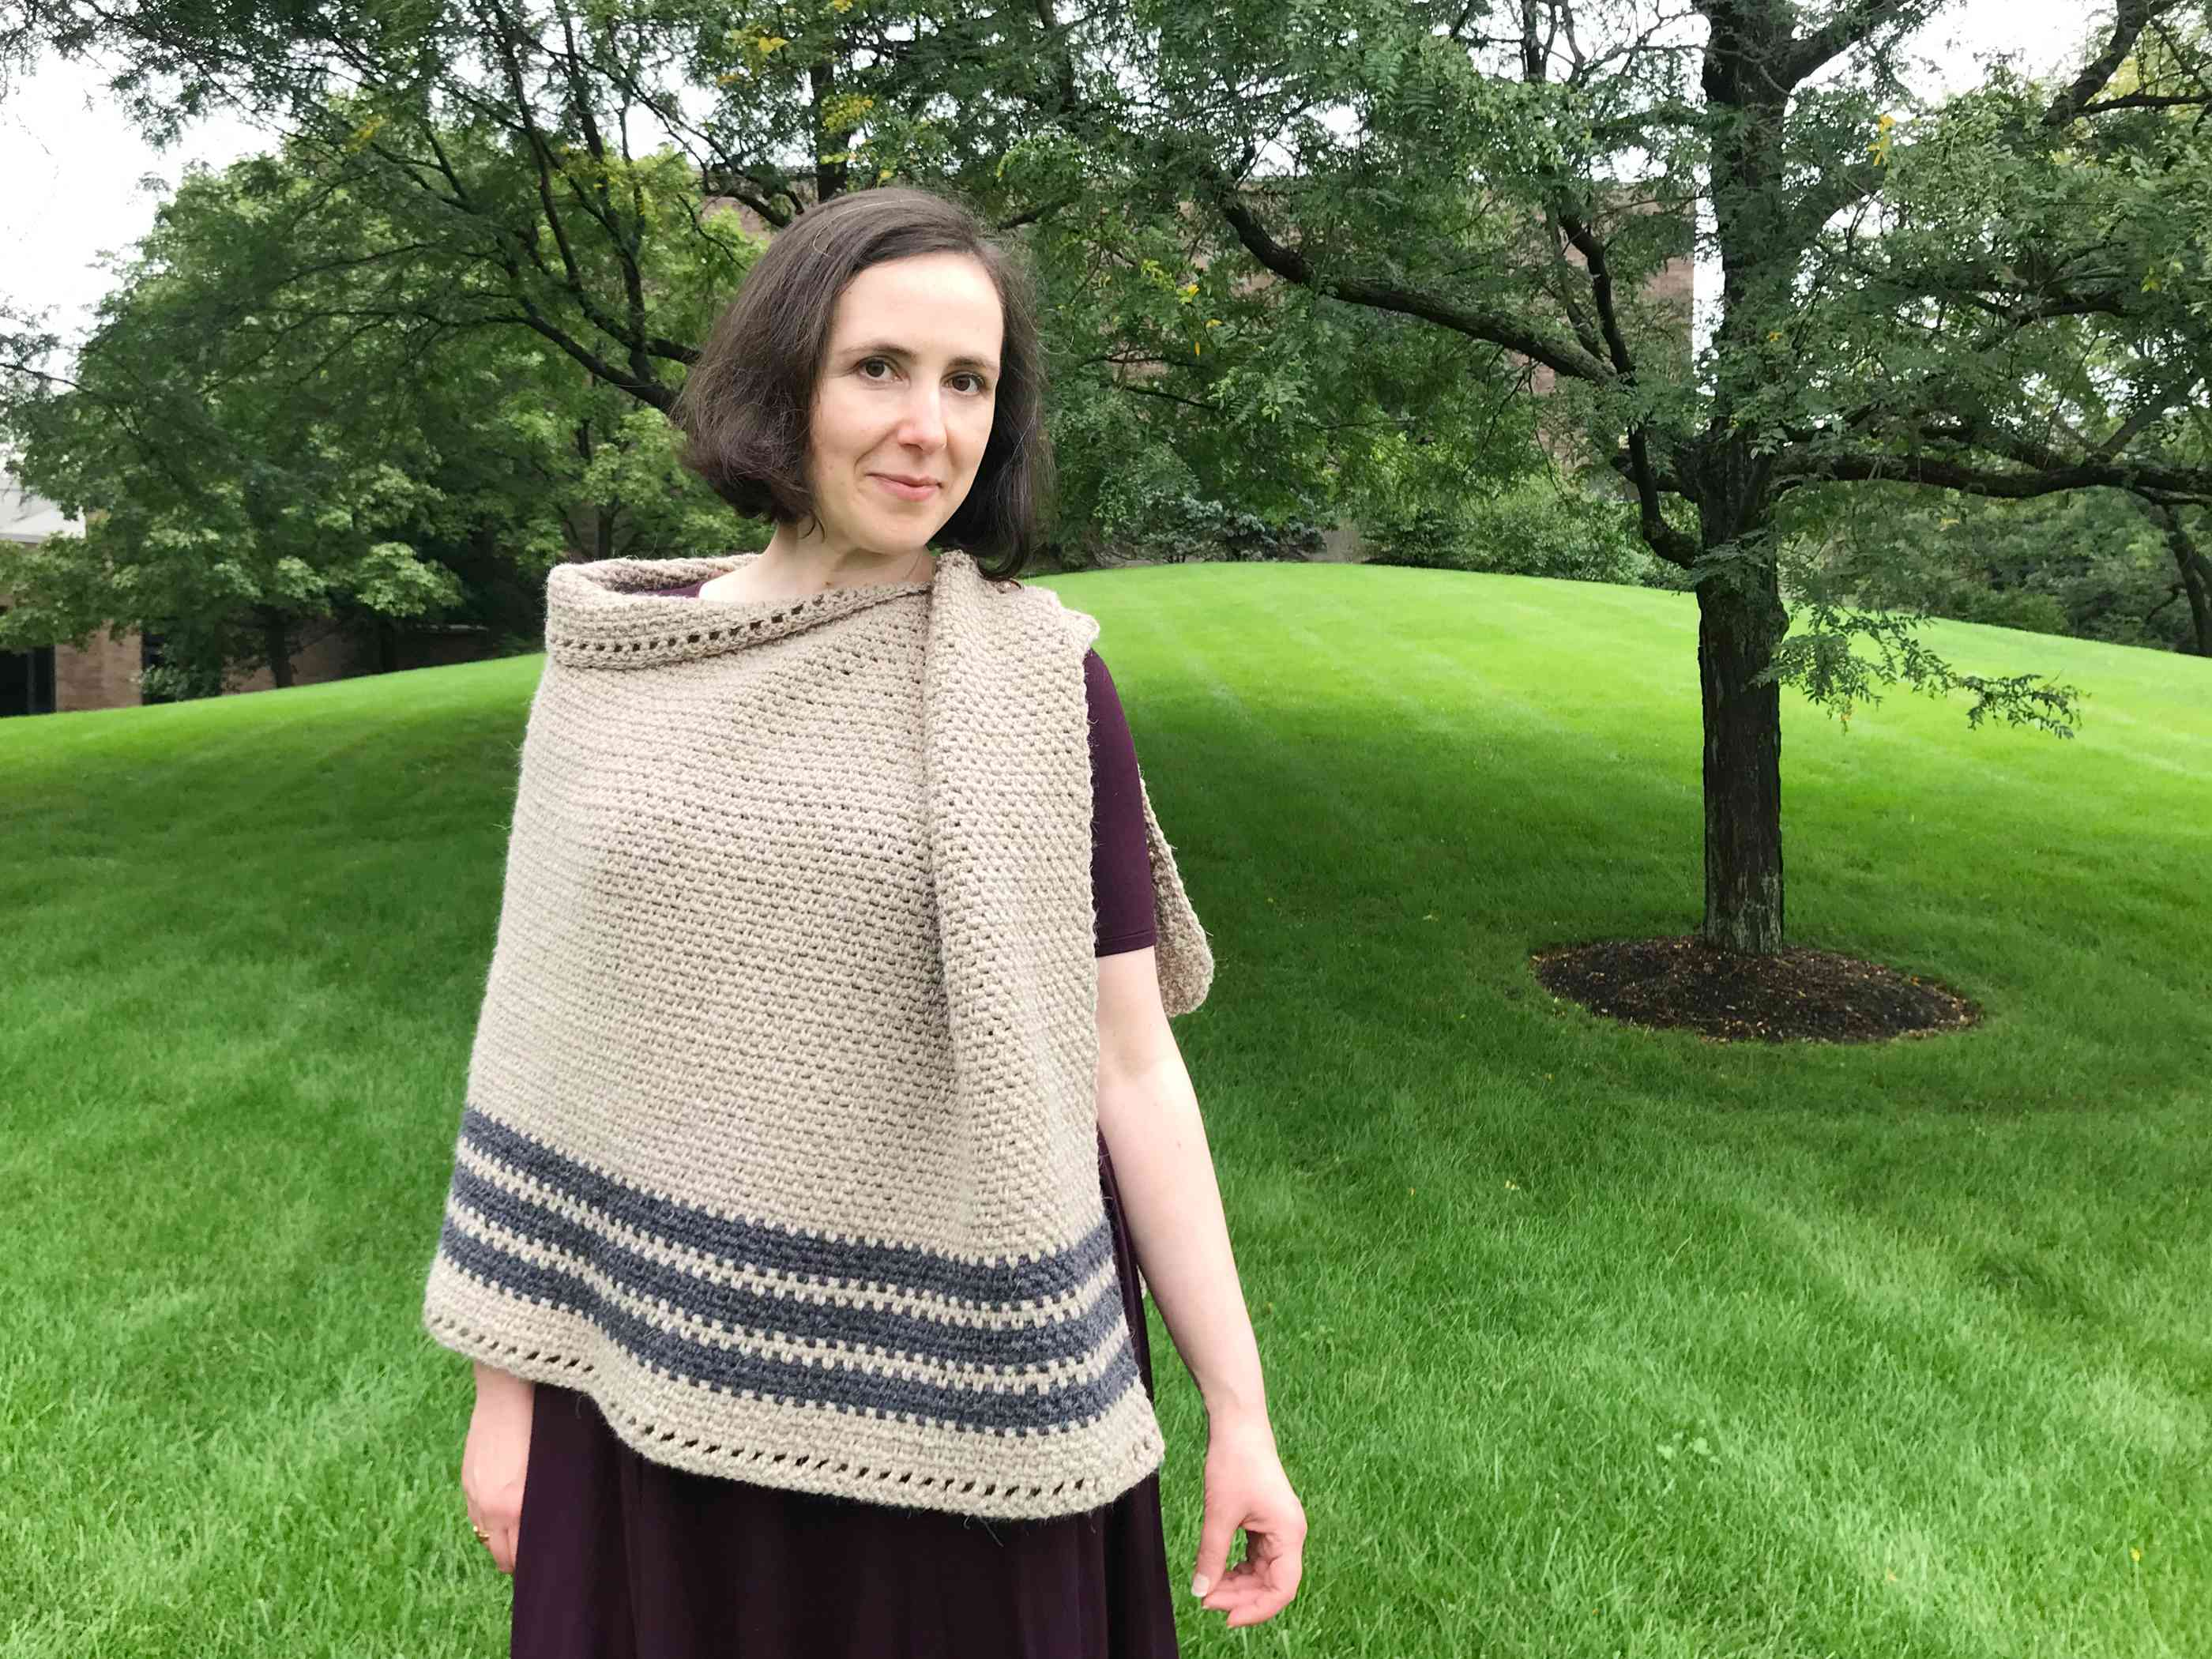 Wearing the Crochet Poncho Open on One Side